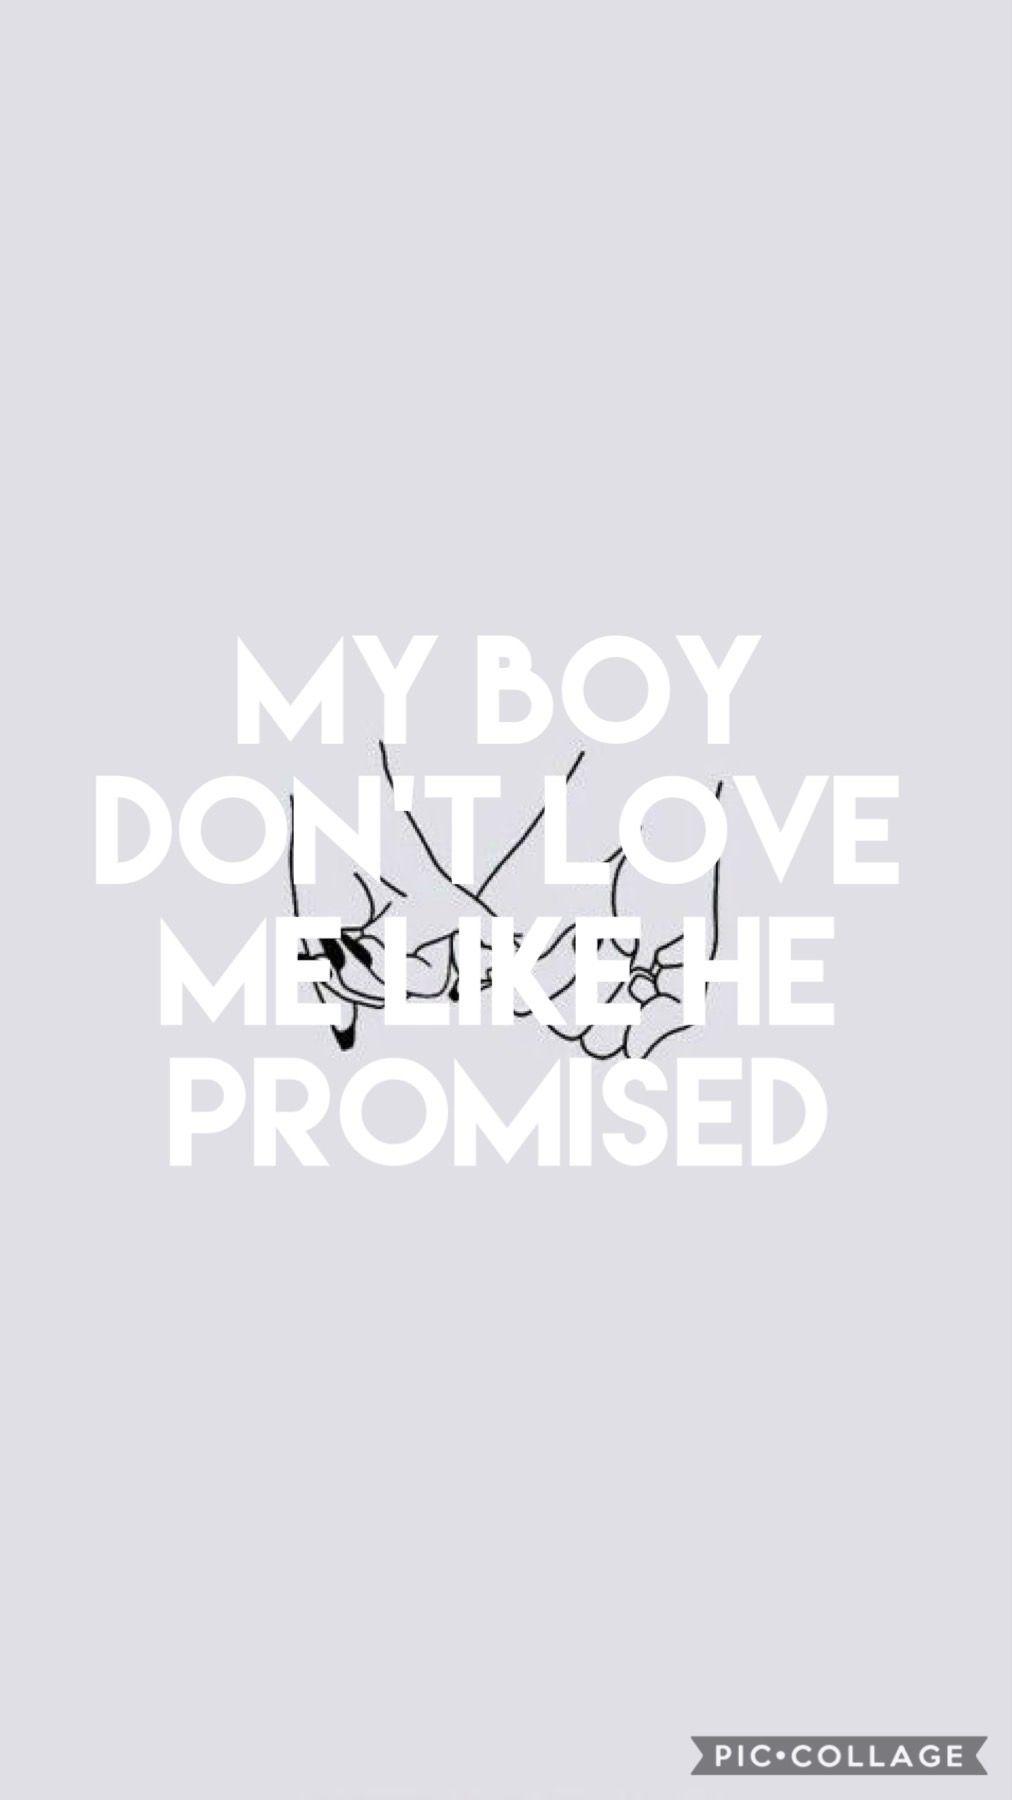 My Husband Is Cheating On Me Billie Eilish Song Lyrics Wallpaper Billie